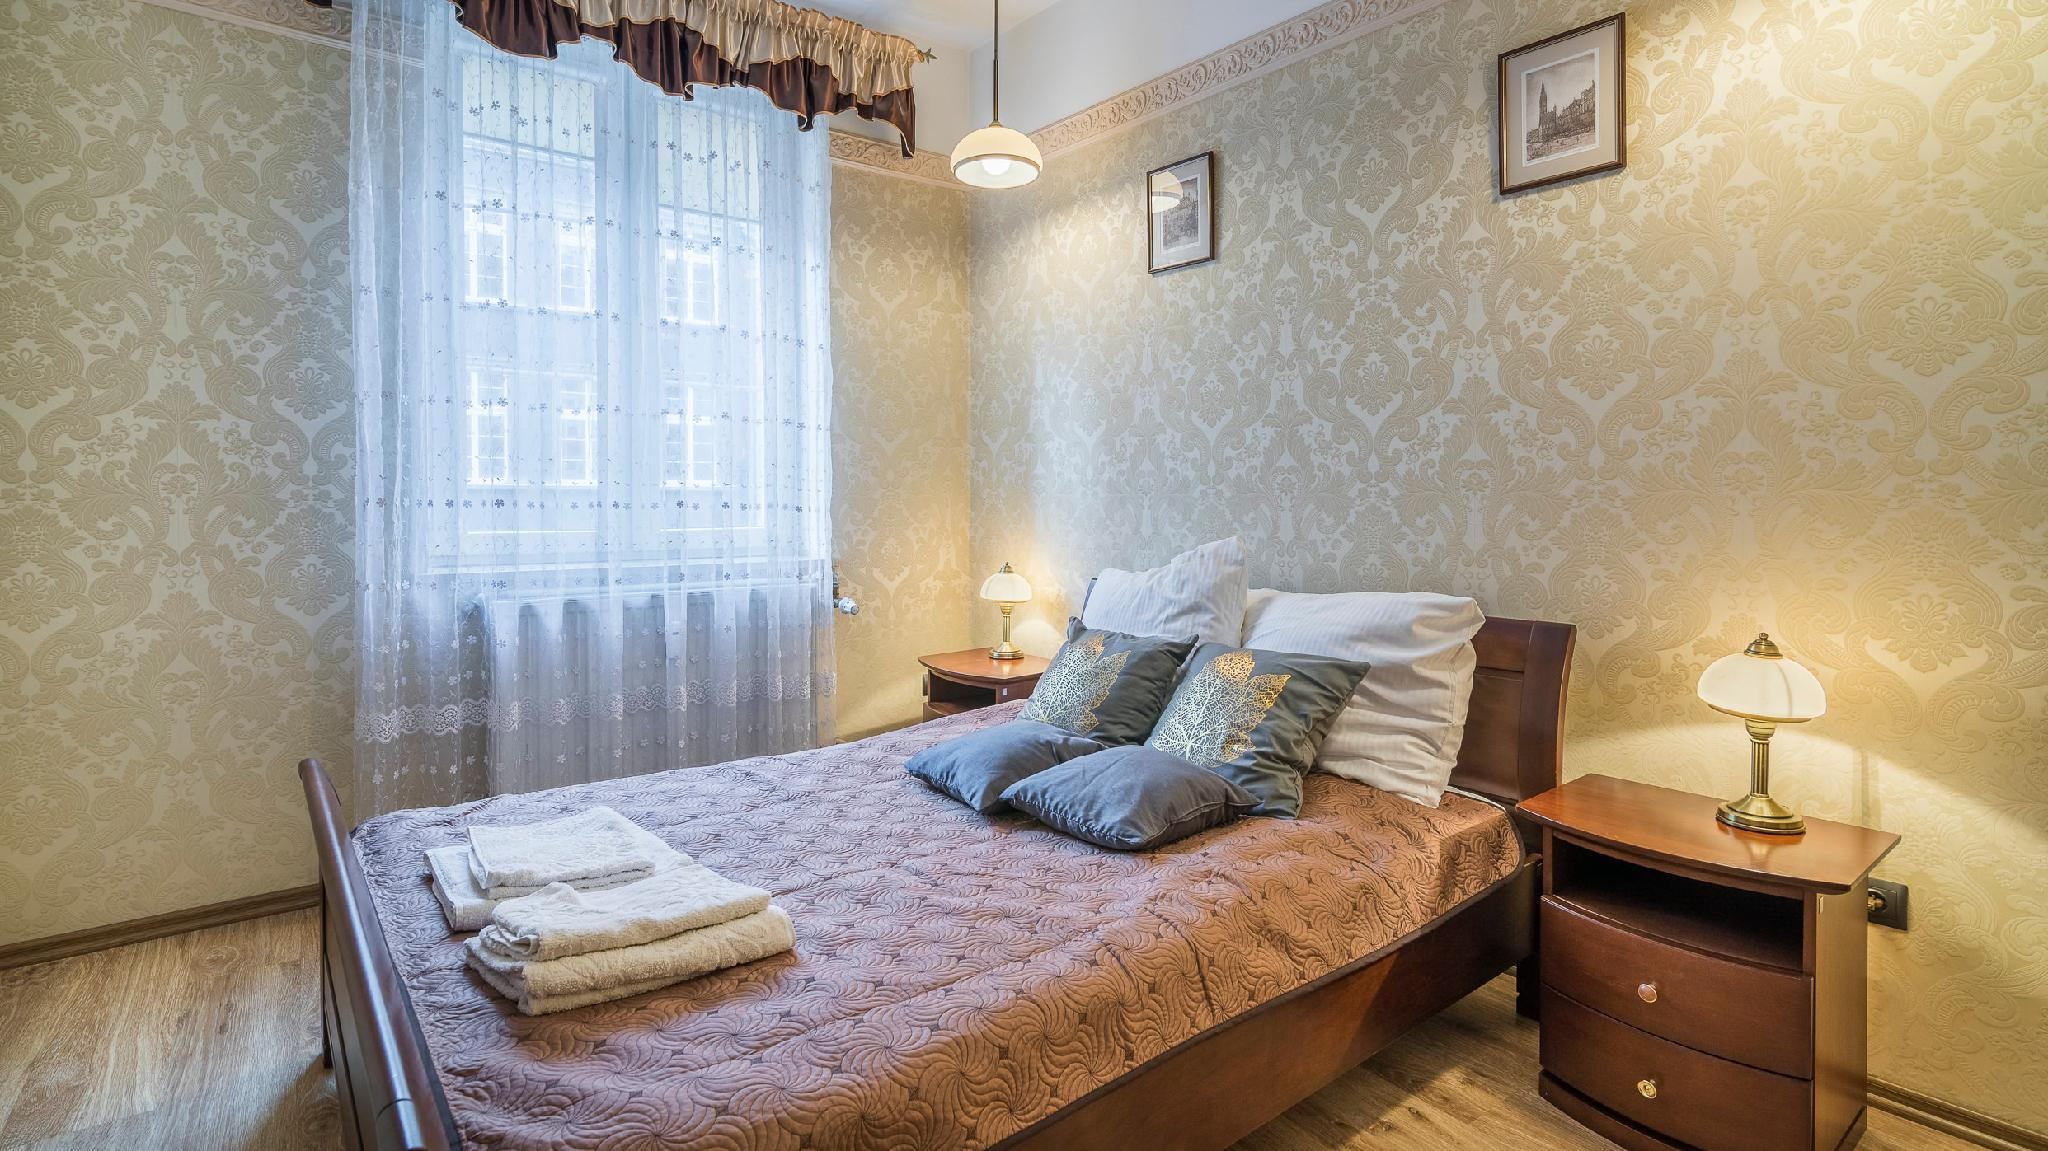 Maya Flats And Resorts Gdansk Old Town Szlachecki